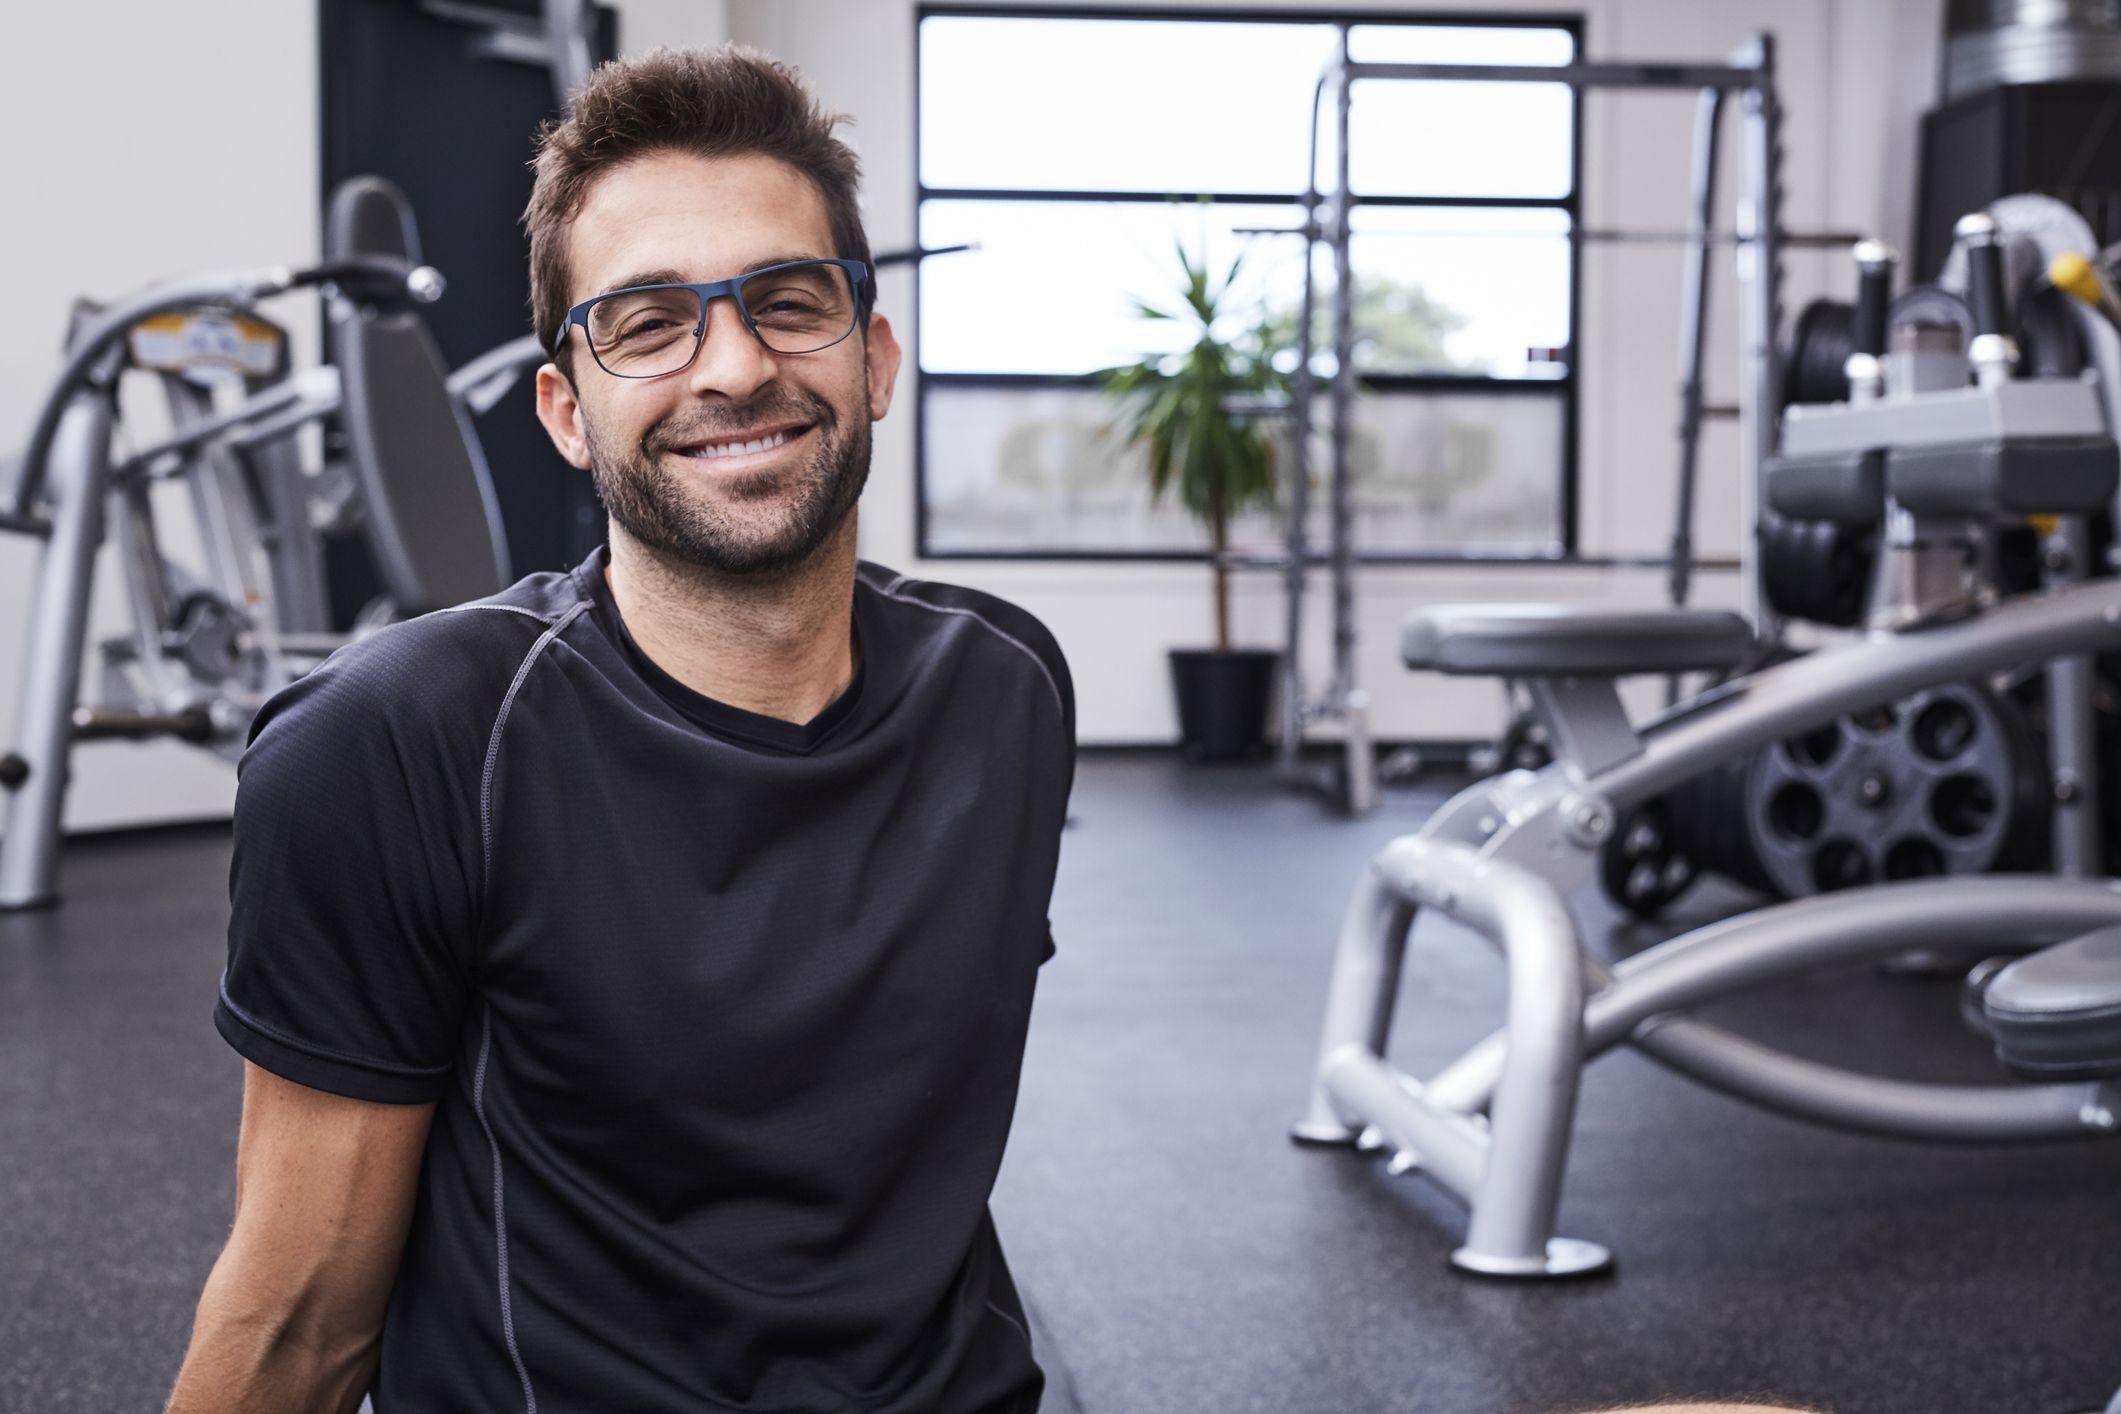 Gafas para hacer deporte